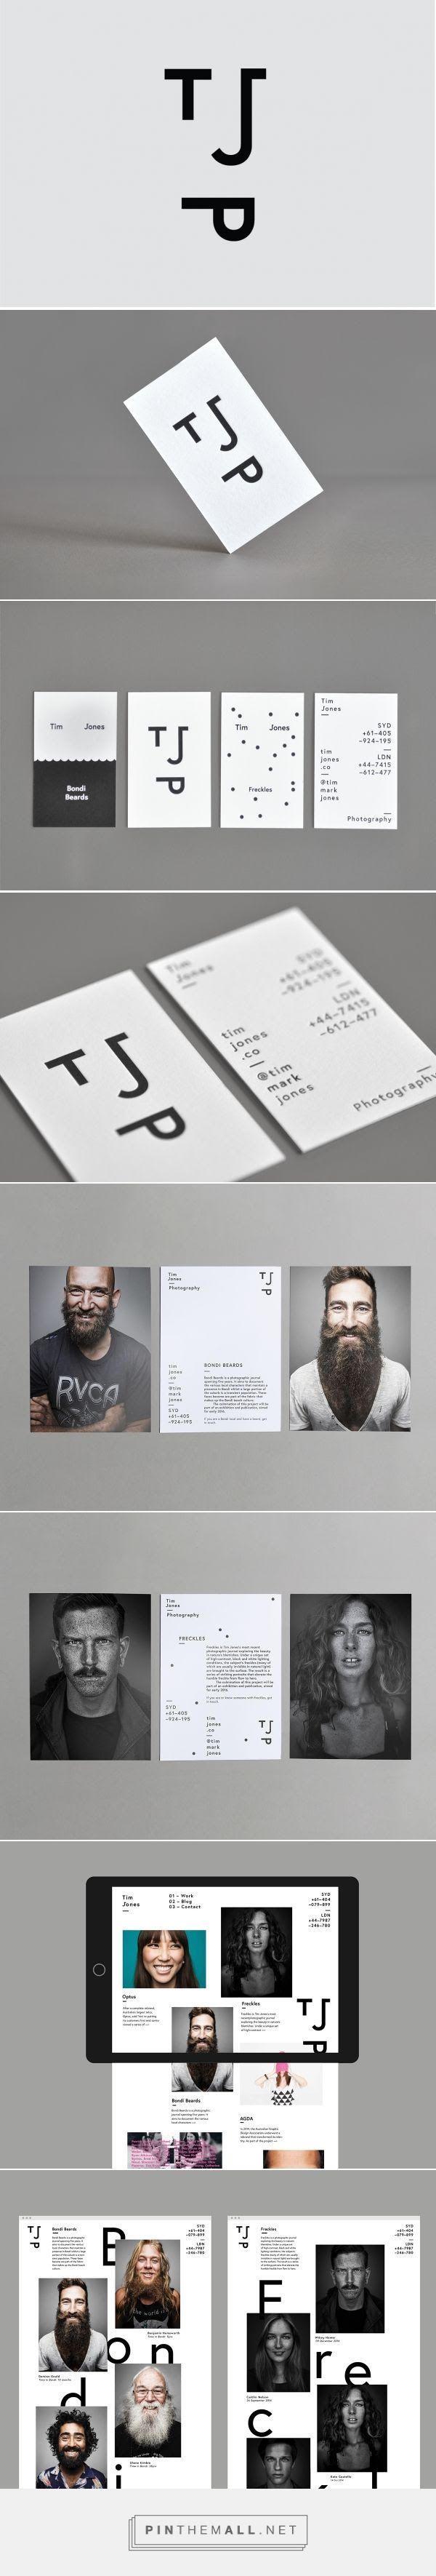 Minimal branding